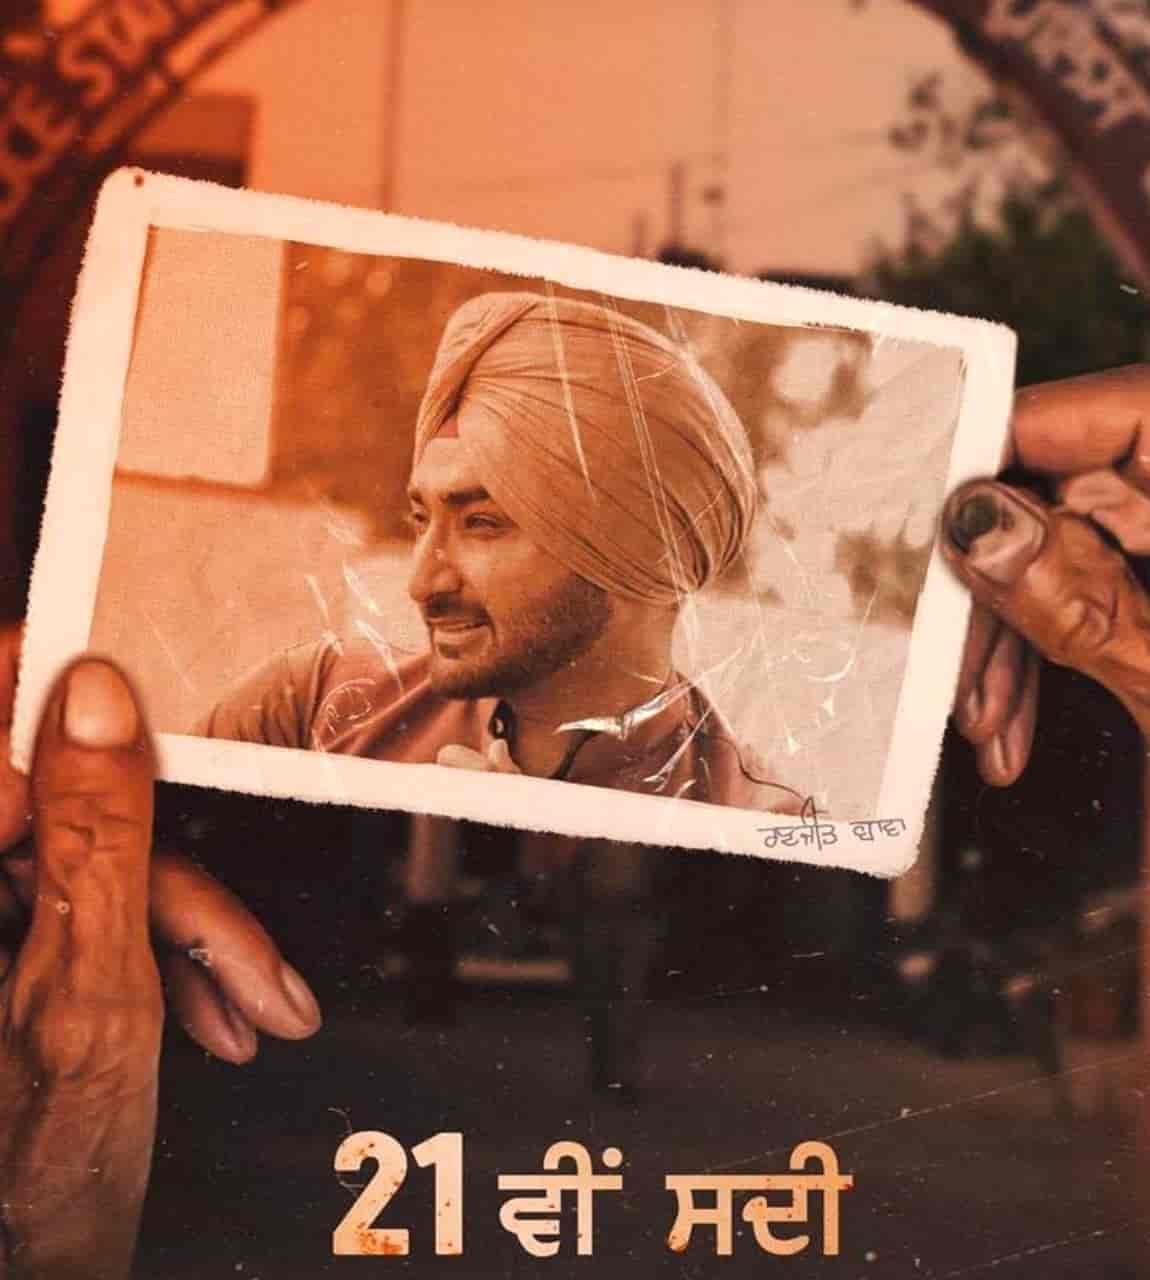 21 Vi Sdi Punjabi Song Image Features Ranjit Bawa